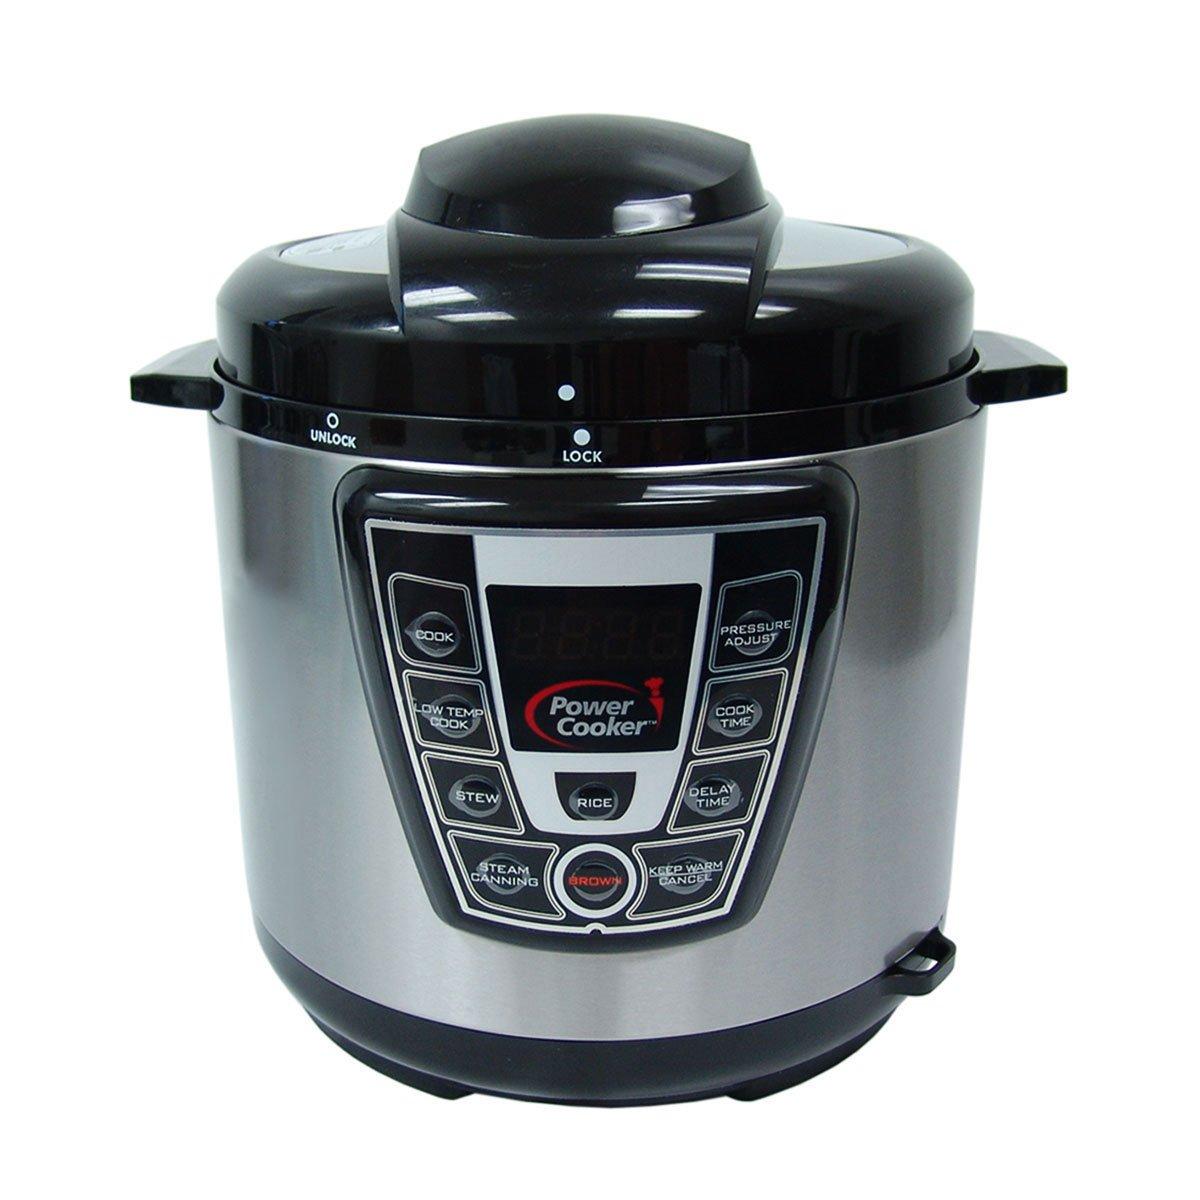 Power Cooker Digital Electric Pressure Cooker 6-Quart (Certified Refurbished)